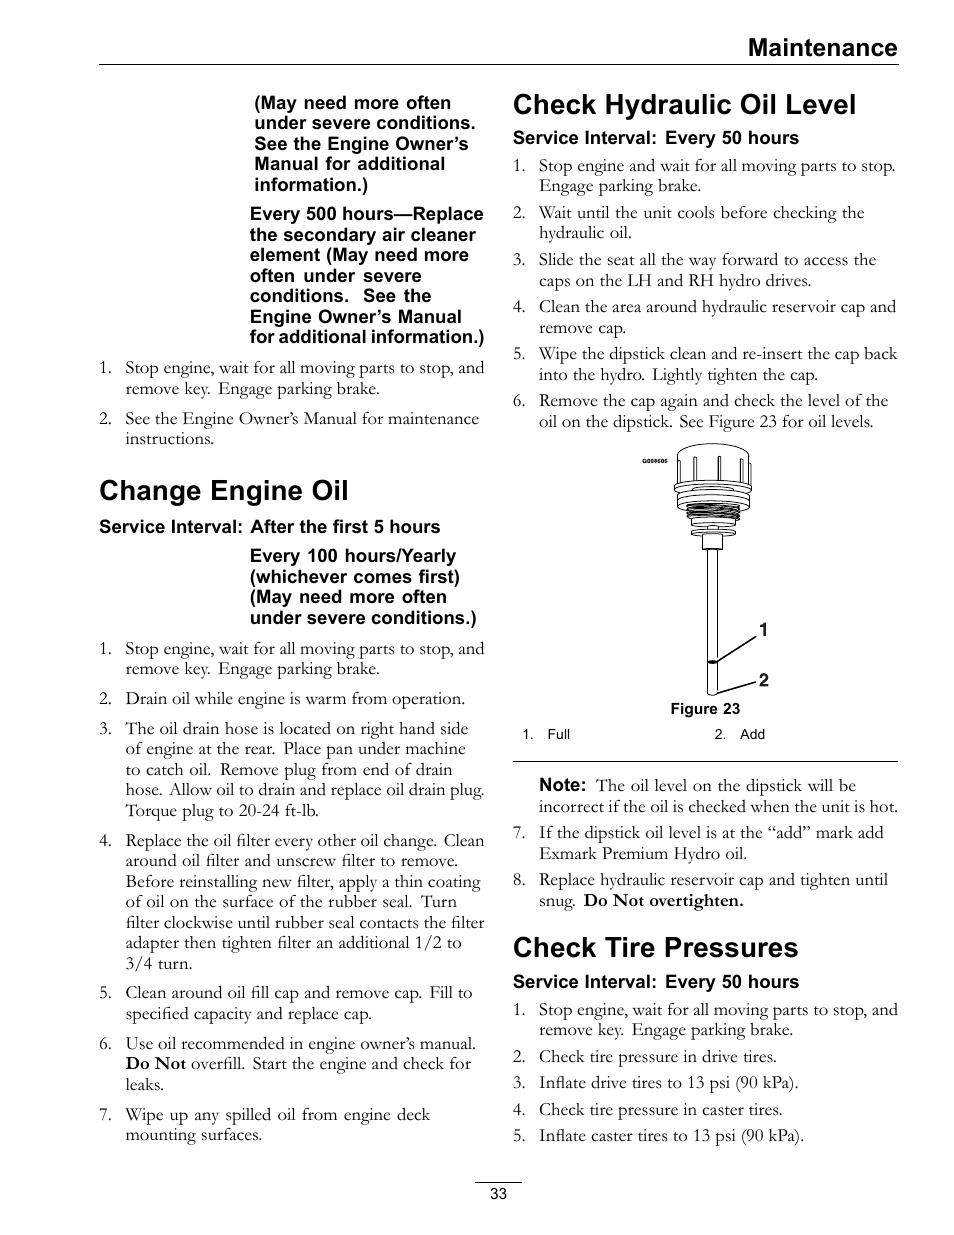 Change engine oil, Check hydraulic oil level, Check tire pressures